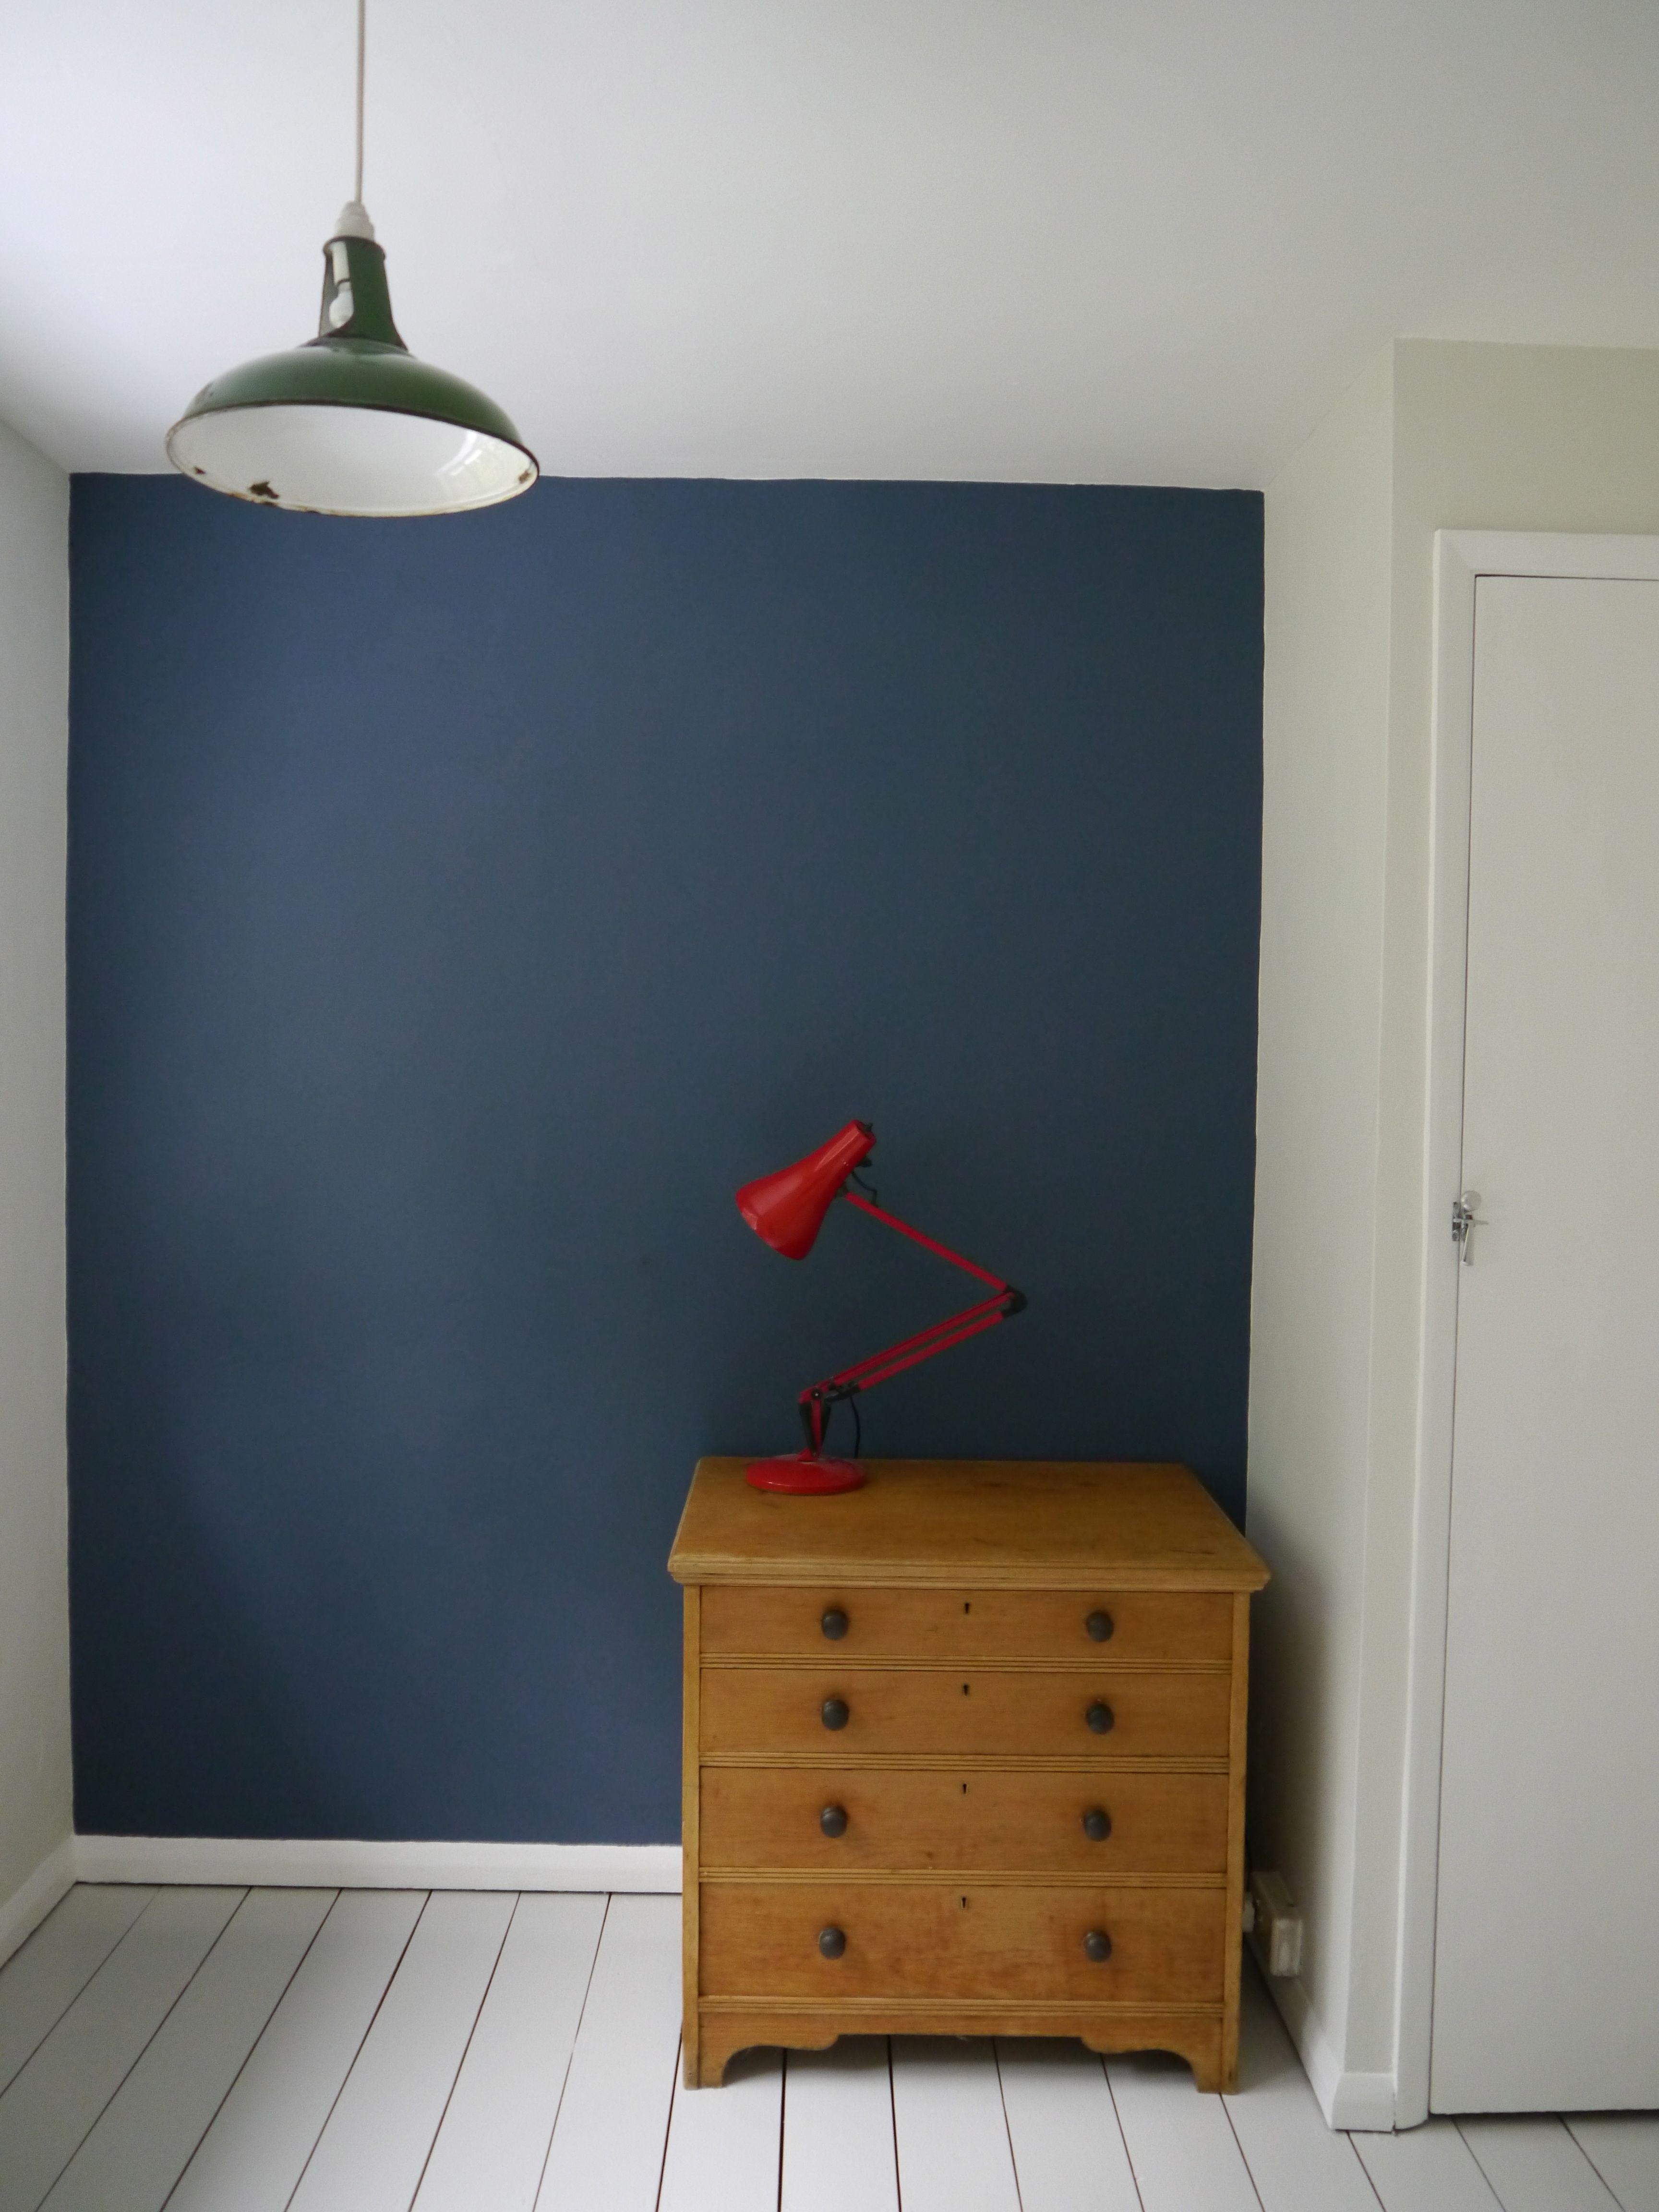 Best Stiffkey Blue Strong White Walls Cornforth White Floor 400 x 300